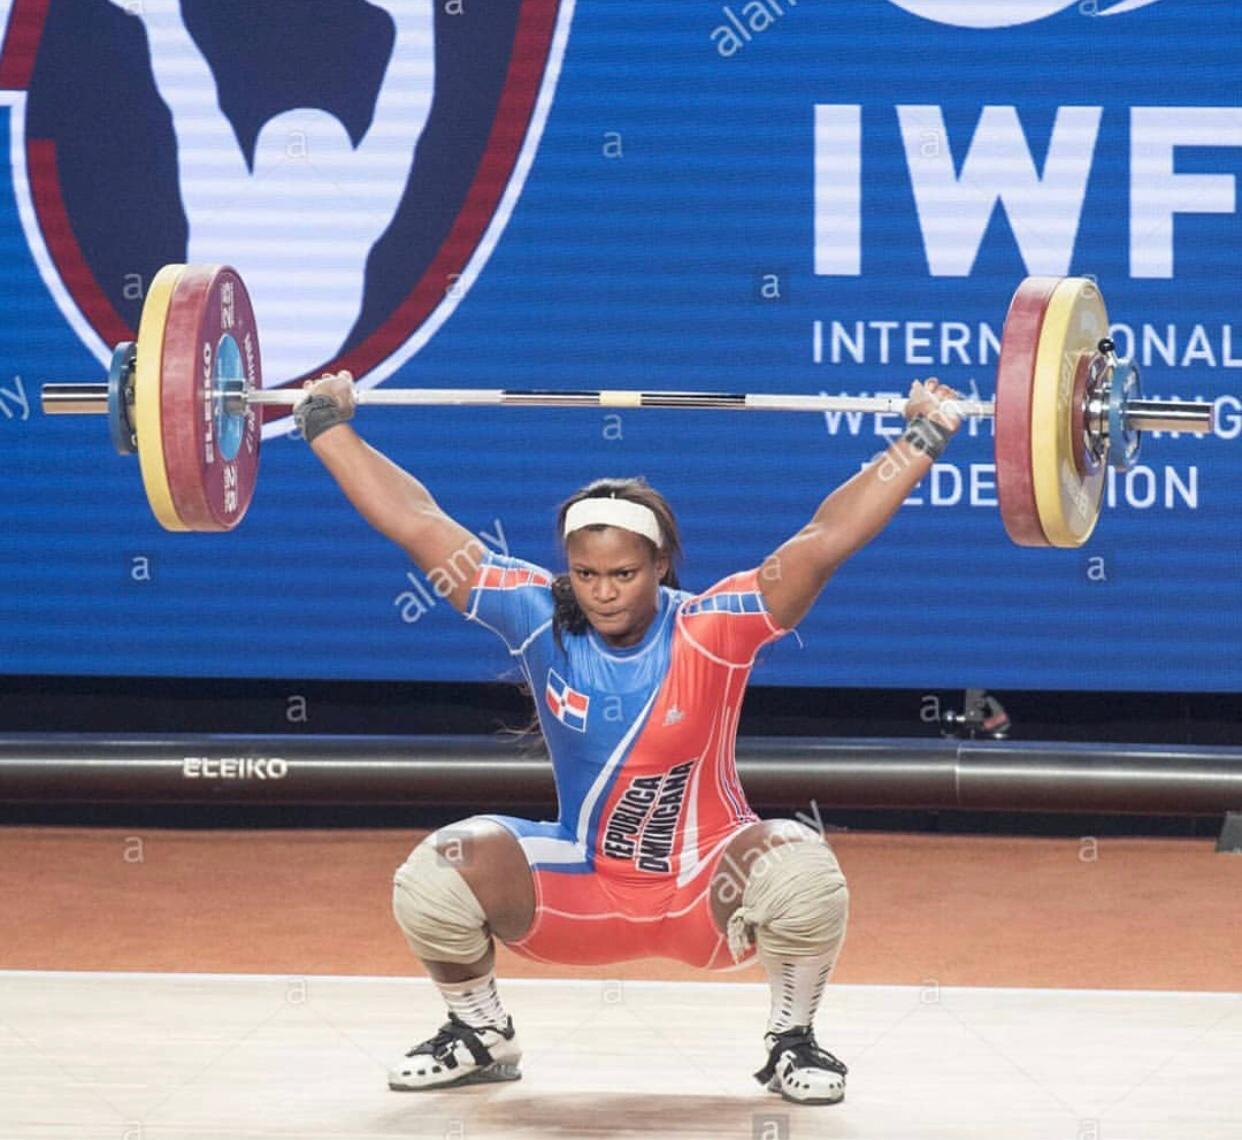 Crismery Santana gana plata y bronce en mundial de pesas